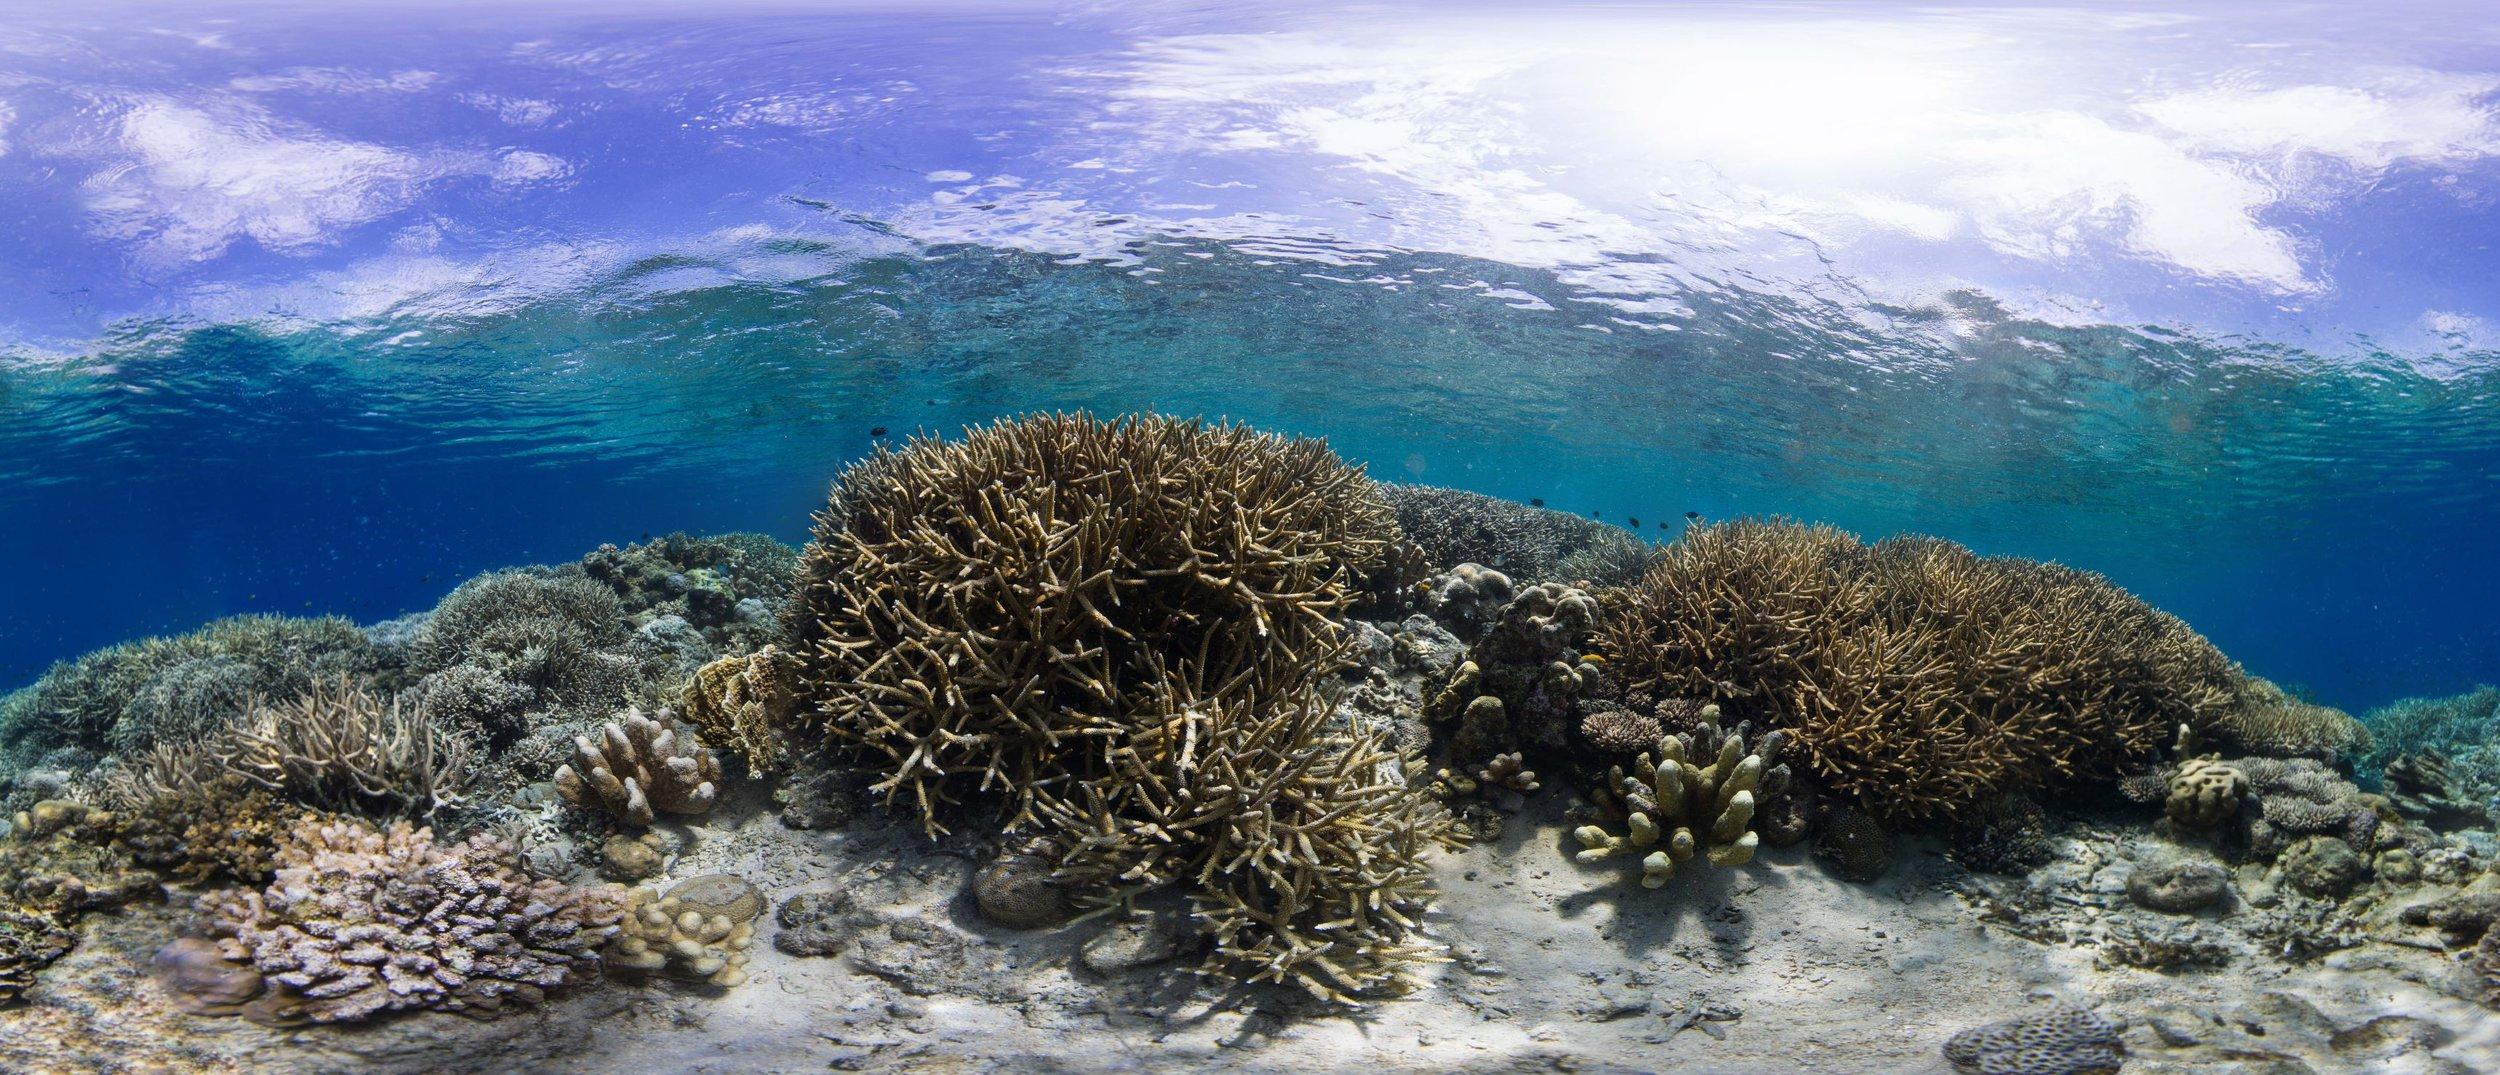 21 - a HEALTHY coral reef in manado, indonesia Credit: The ocean agency / paul g. allen philanthropies